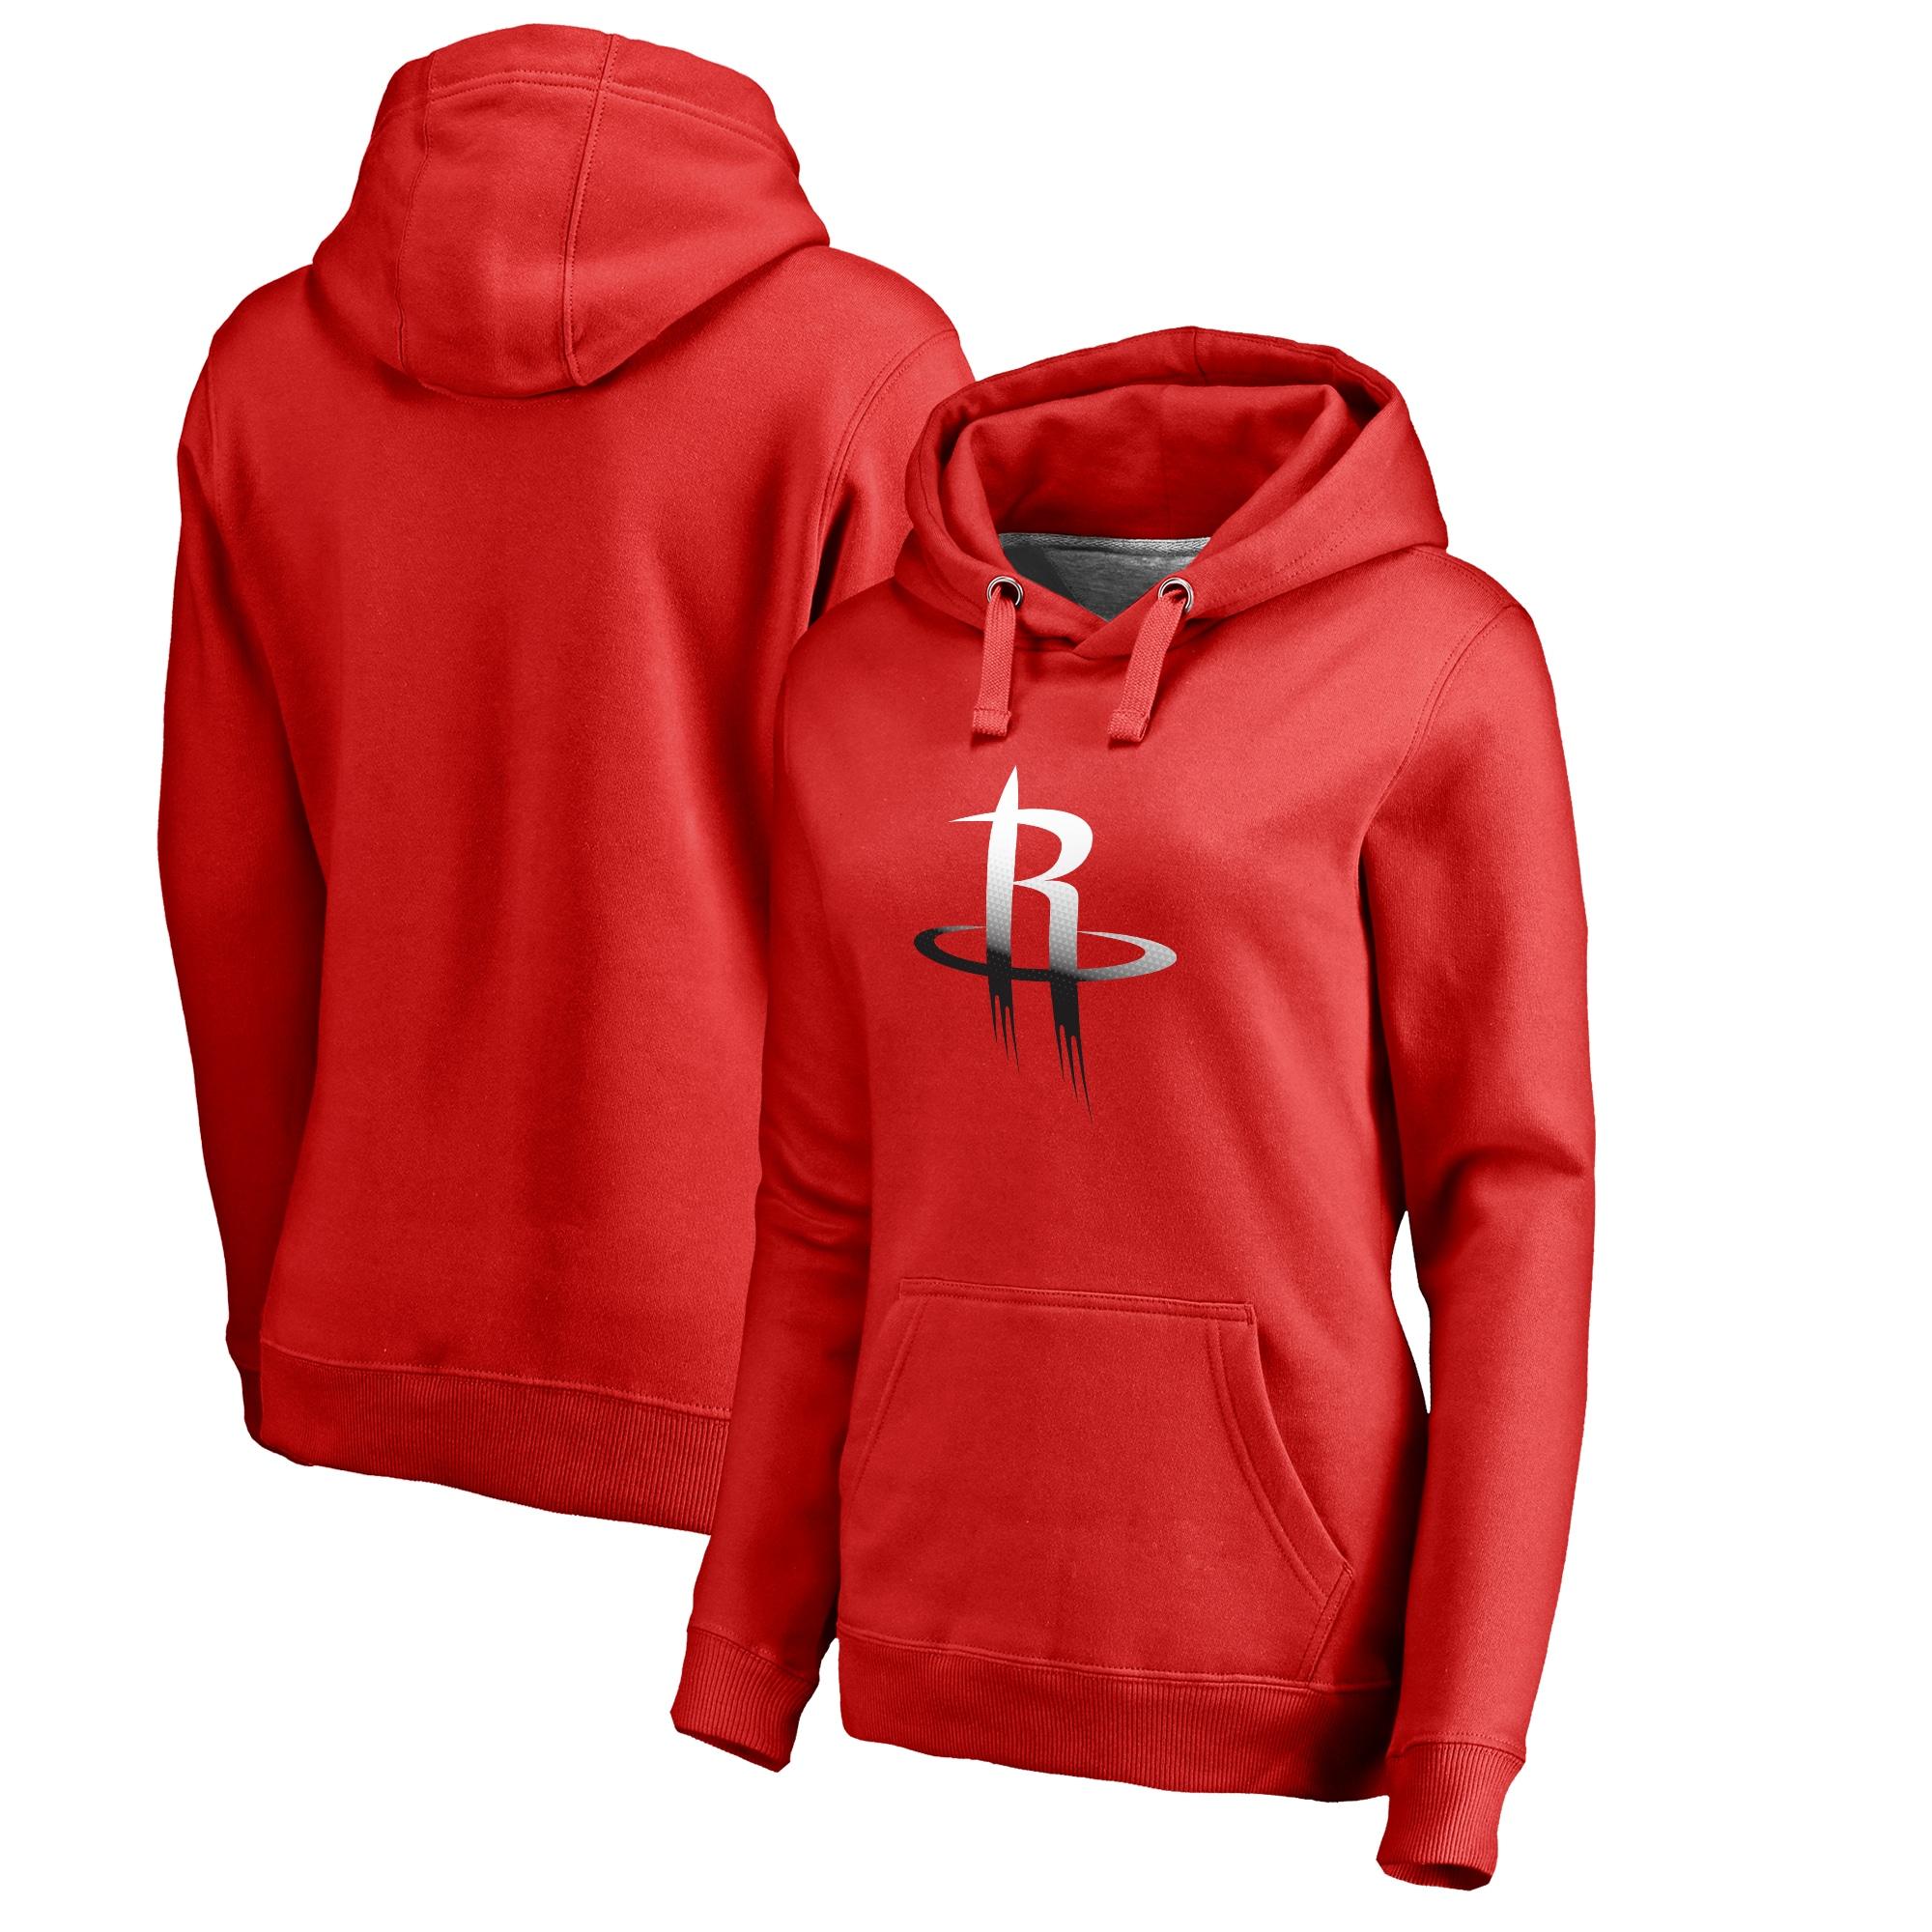 Houston Rockets Fanatics Branded Women's Plus Sizes Gradient Logo Pullover Hoodie - Red